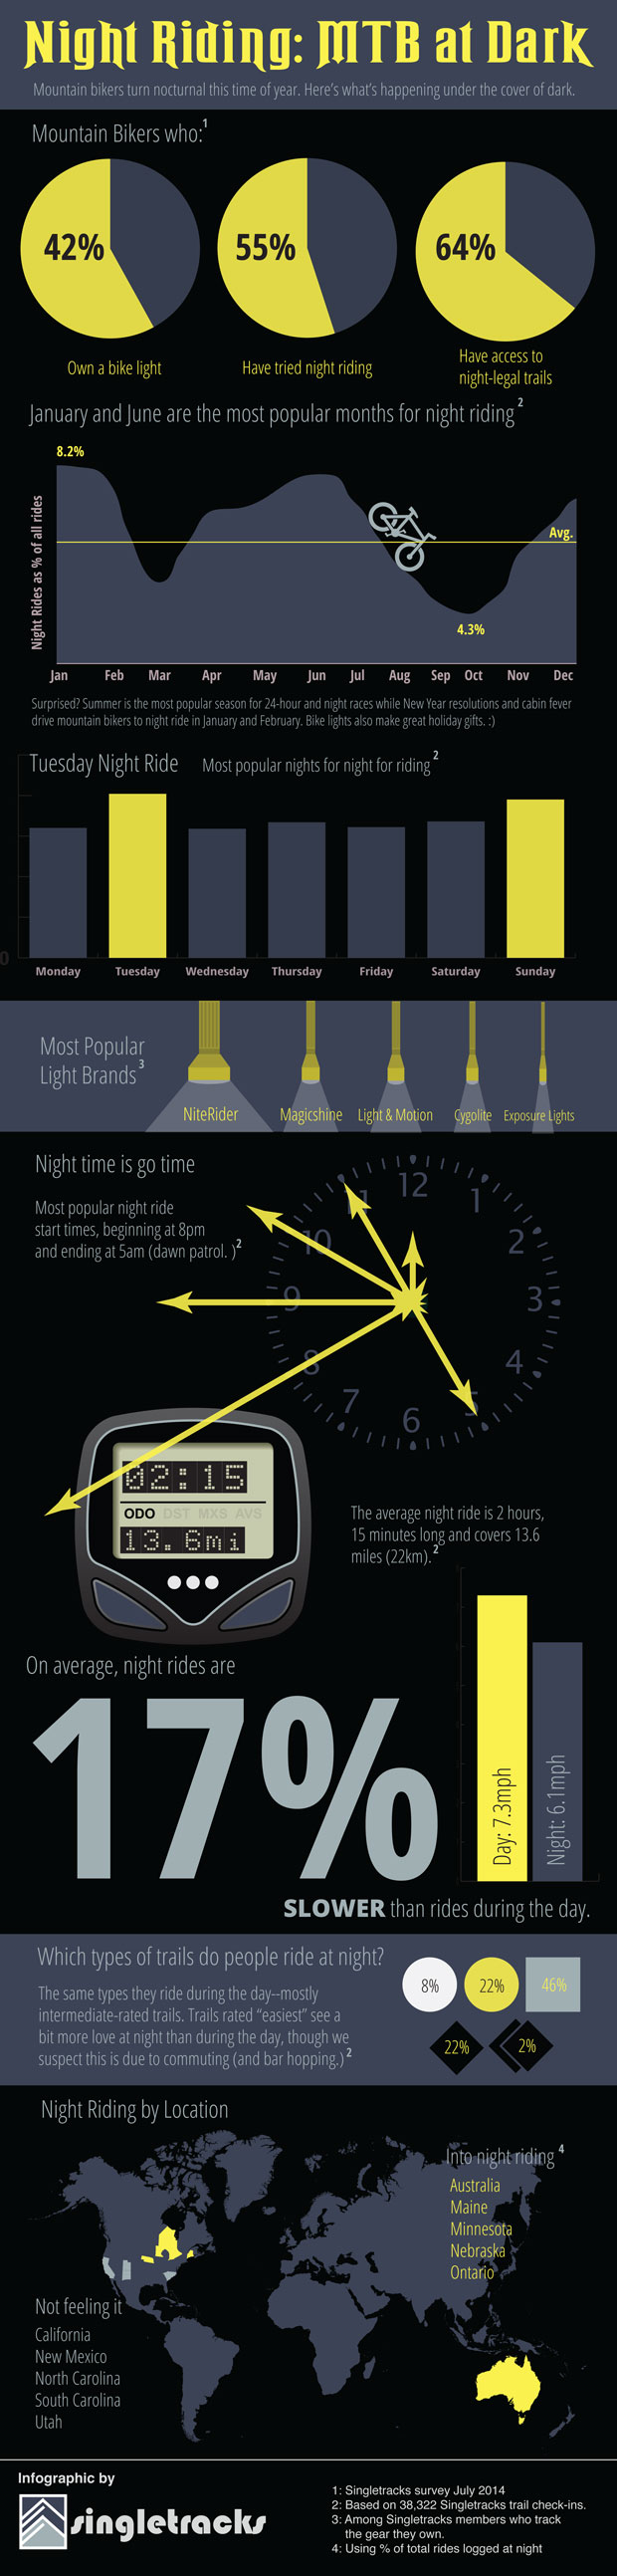 nightriding_infographic_sm